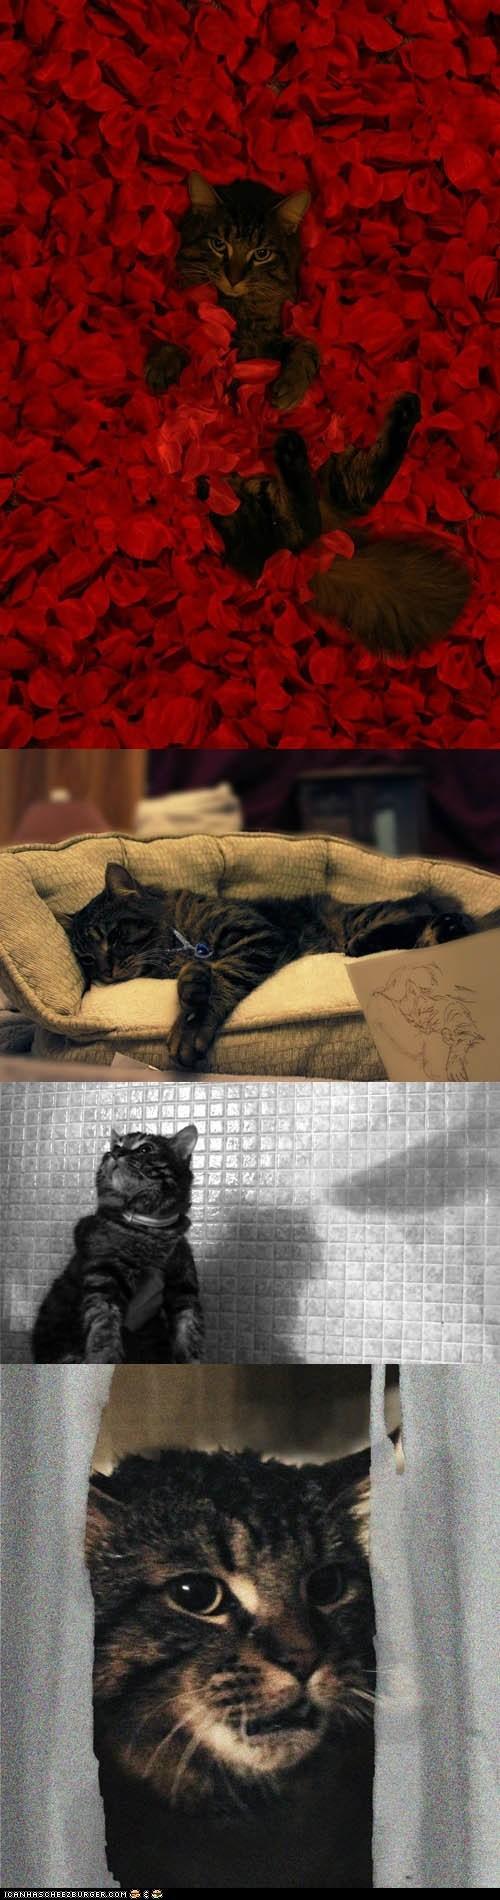 American Beauty Cats films movies psycho reenactments scenes the shining titanic - 6321004288